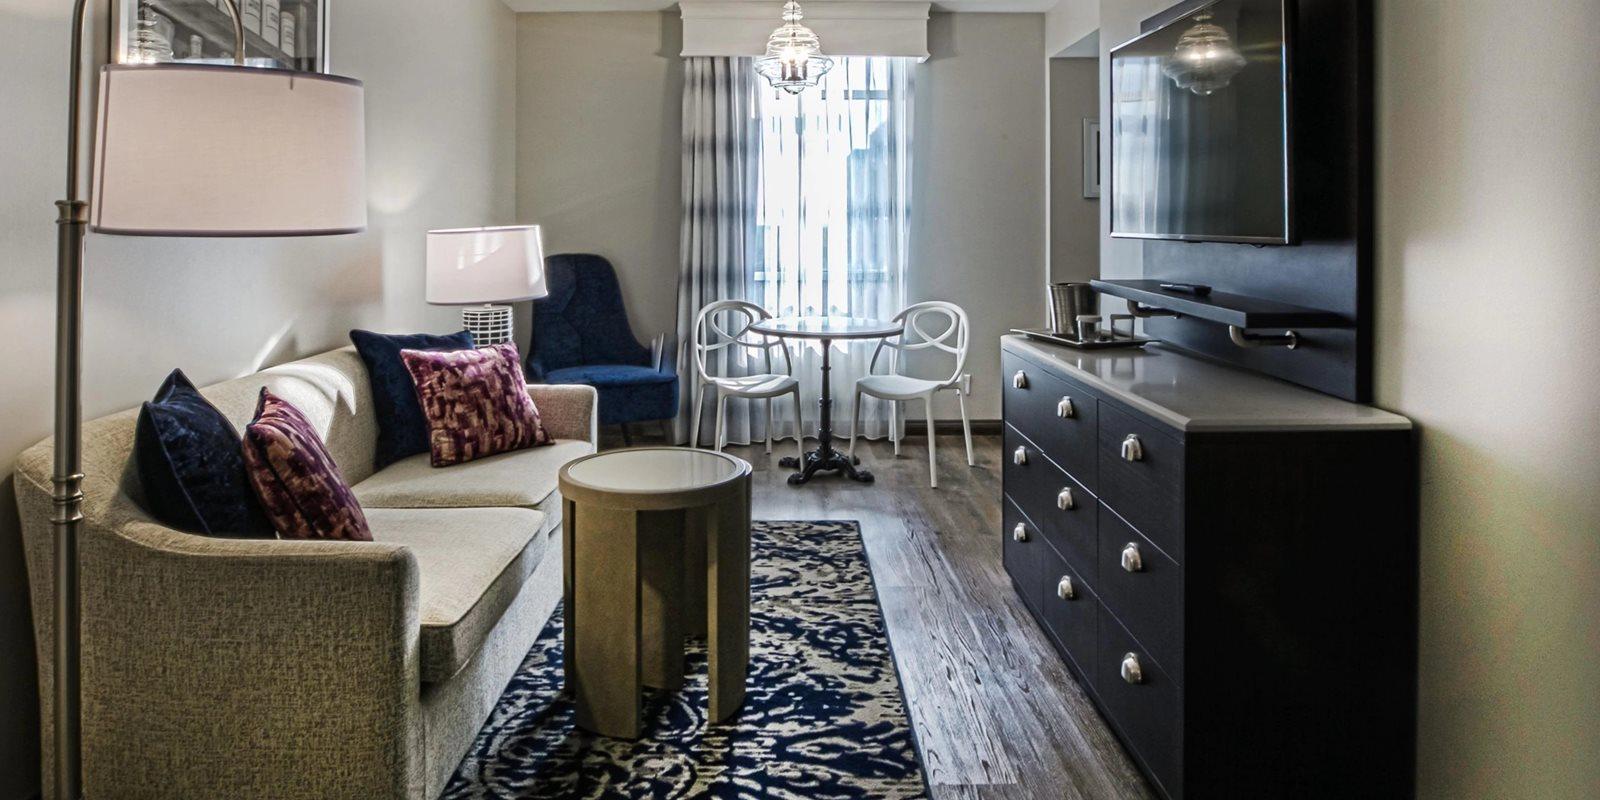 Hotel-Indigo-Birmingham-AL-Guest-room-Living-Room-Area.jpg